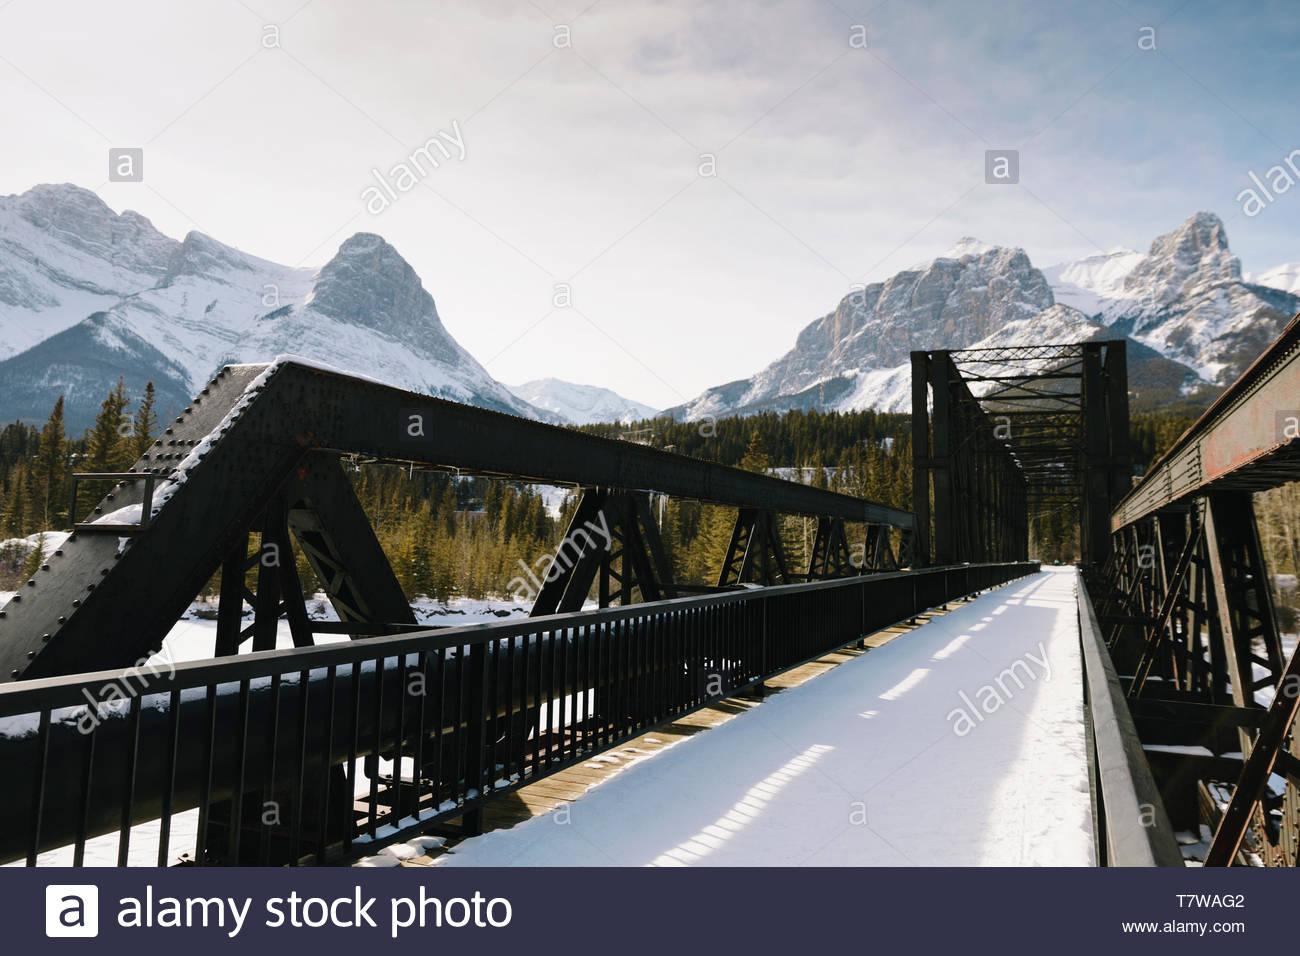 Snow covered bridge below mountains - Stock Image